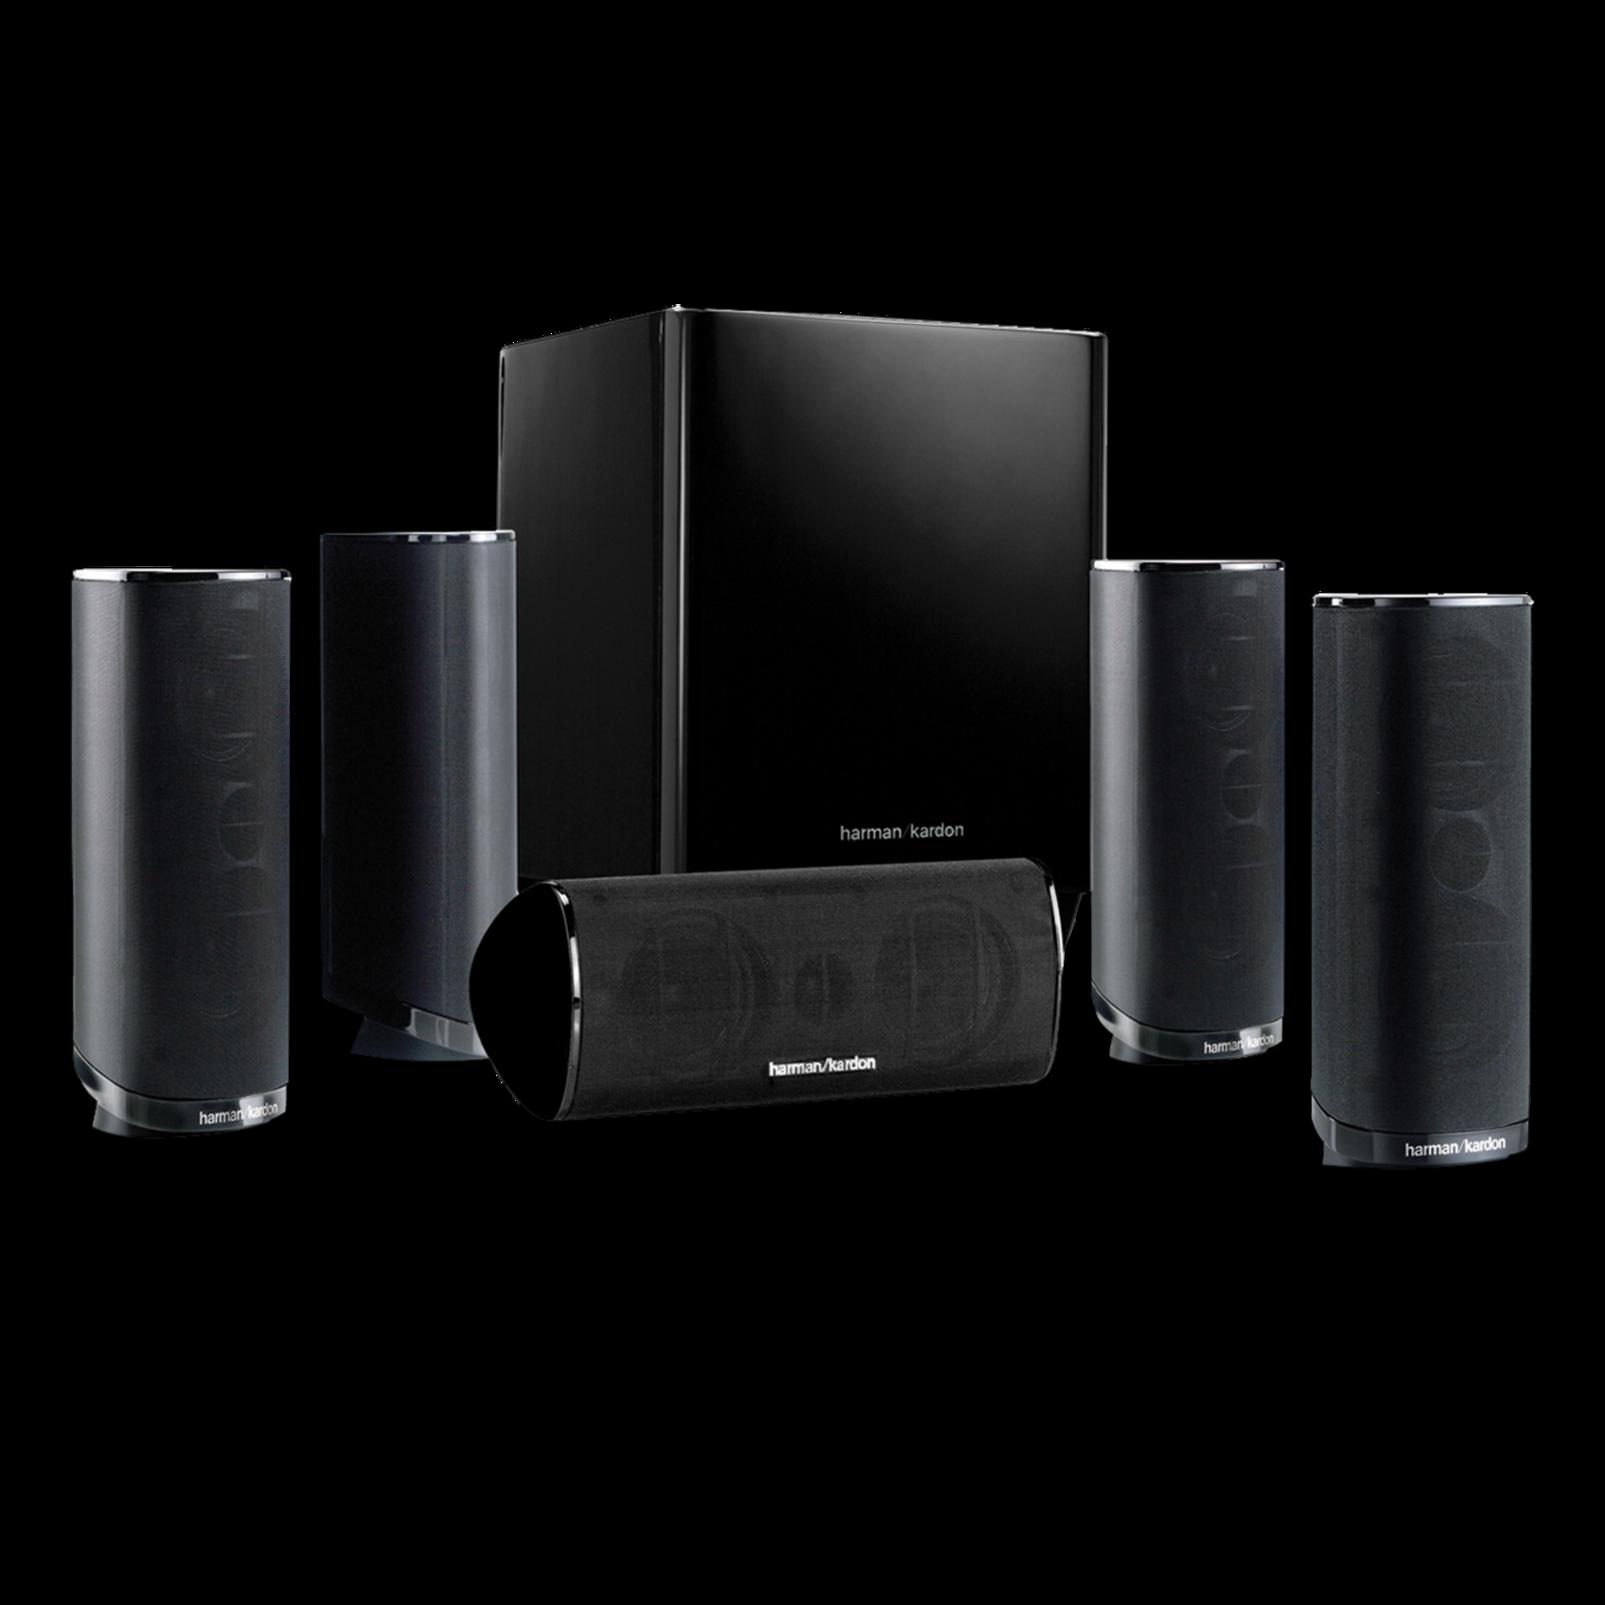 Harman Kardon HKTS 16 5.1-Channel Home Theater Speaker System  $185 + Free Shipping